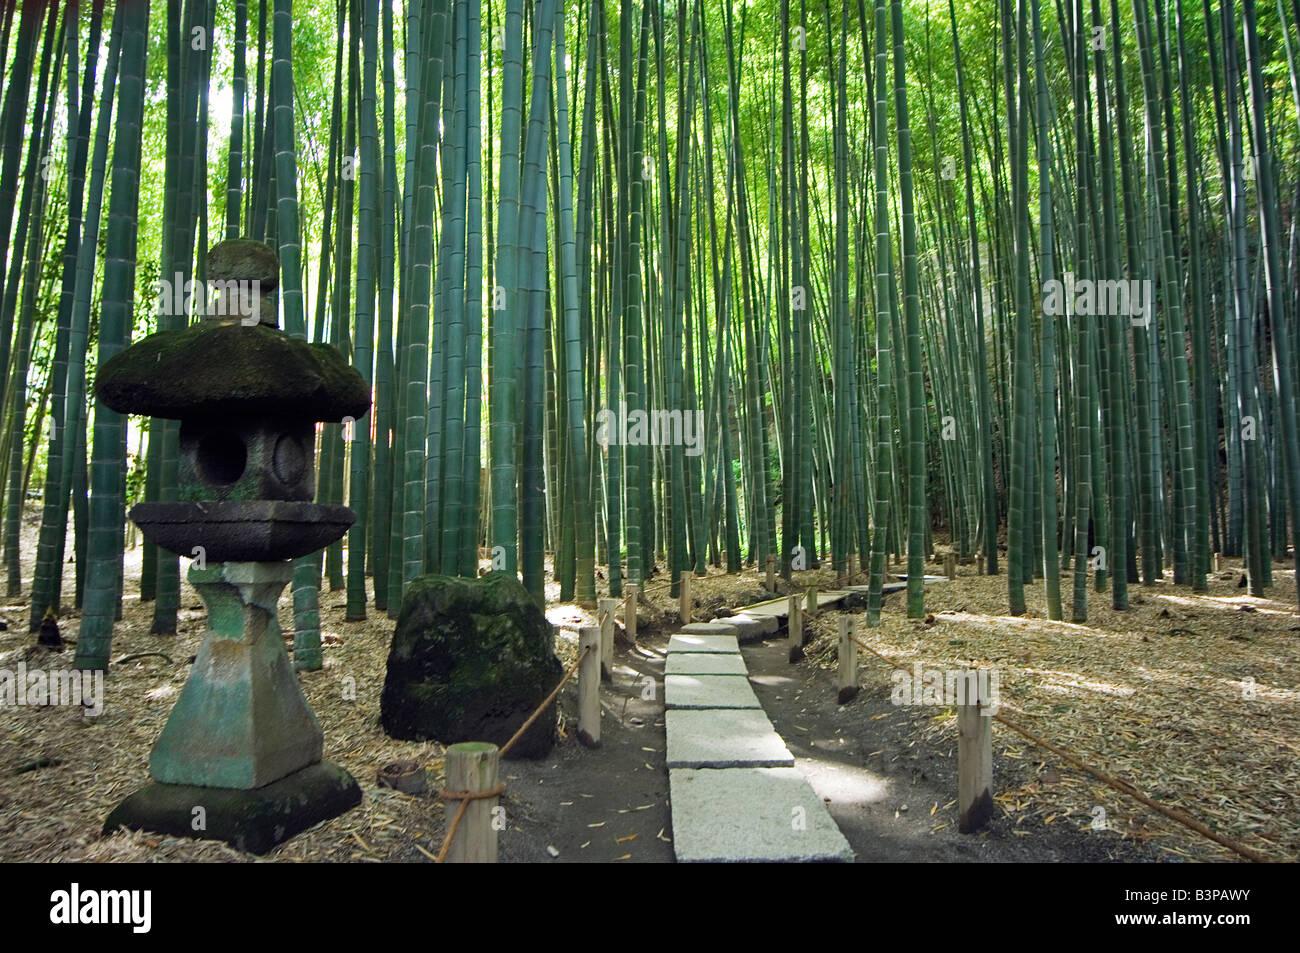 Japan, Kanagawa prefecture, Kamakura. Kamakura bamboo forest and stone lantern in Hokokuji temple garden - Stock Image